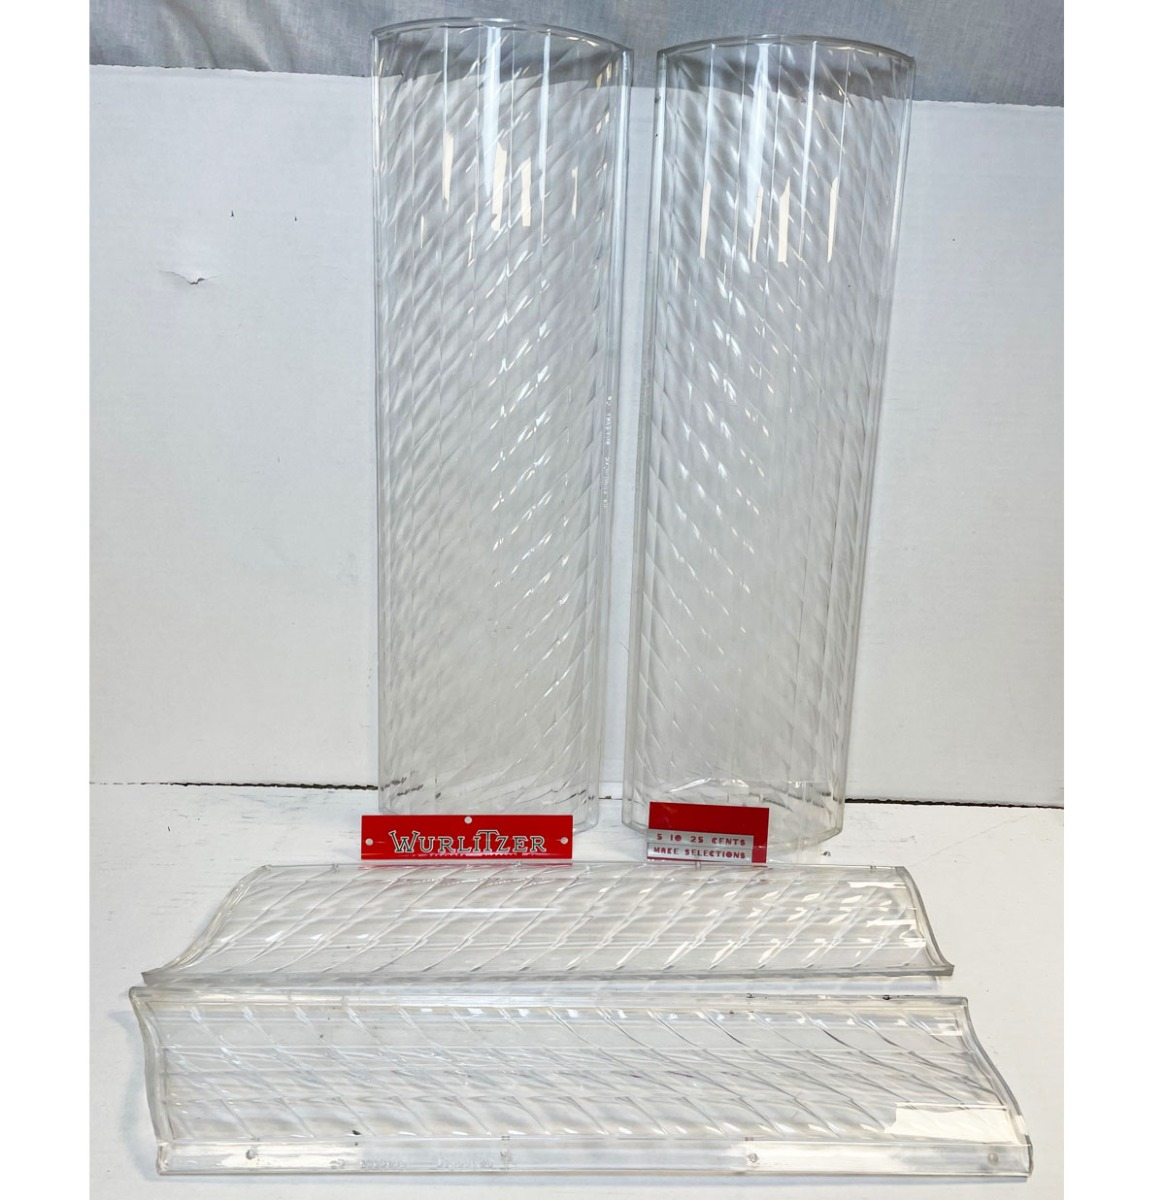 Wurlitzer Model 1100 Plastic 4 Delige Set Incl. Make Selection, 5-10-25 En Wurlitzer Plastics